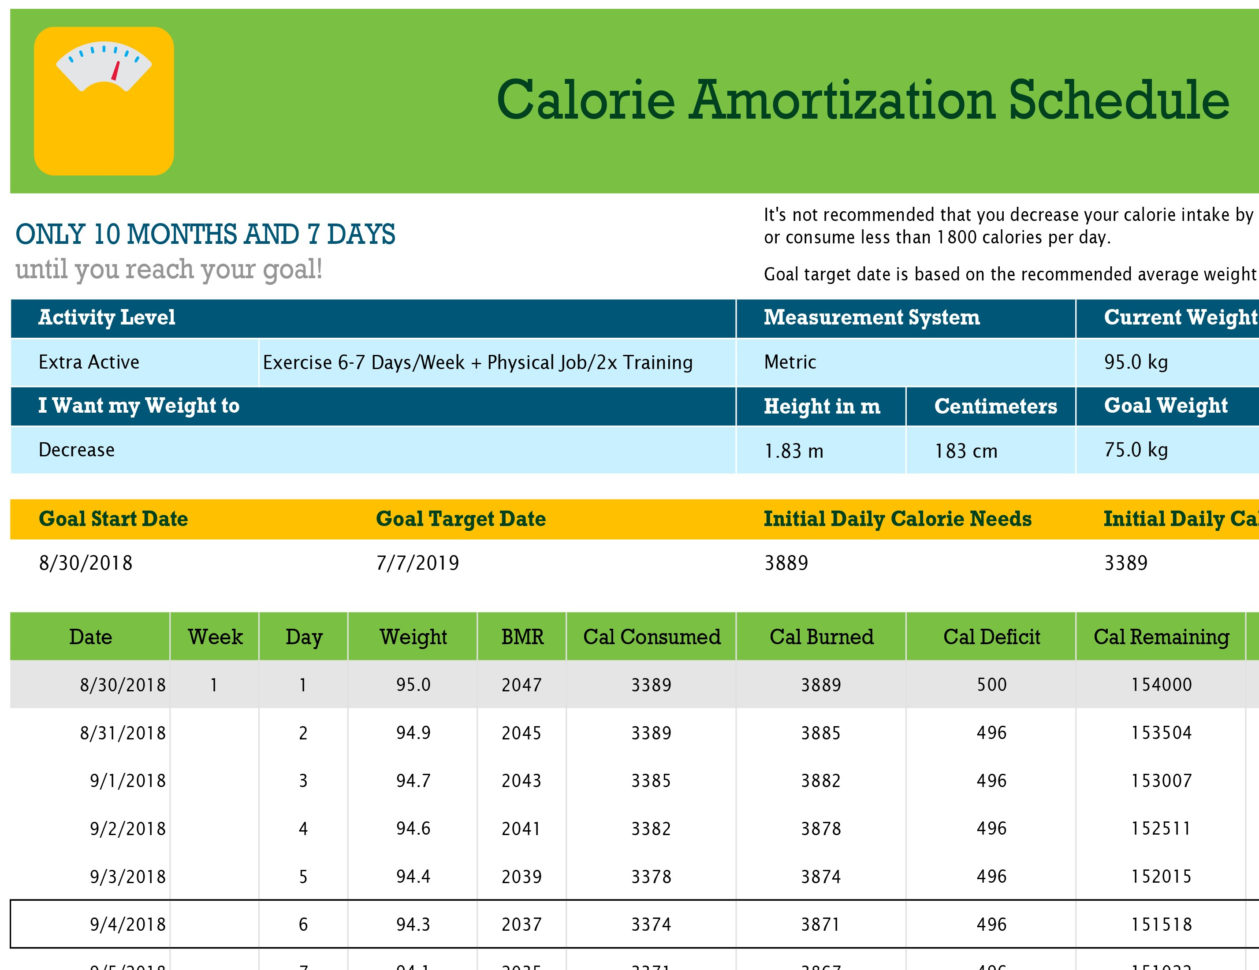 Calorie Intake Spreadsheet Throughout Calorie Amortization